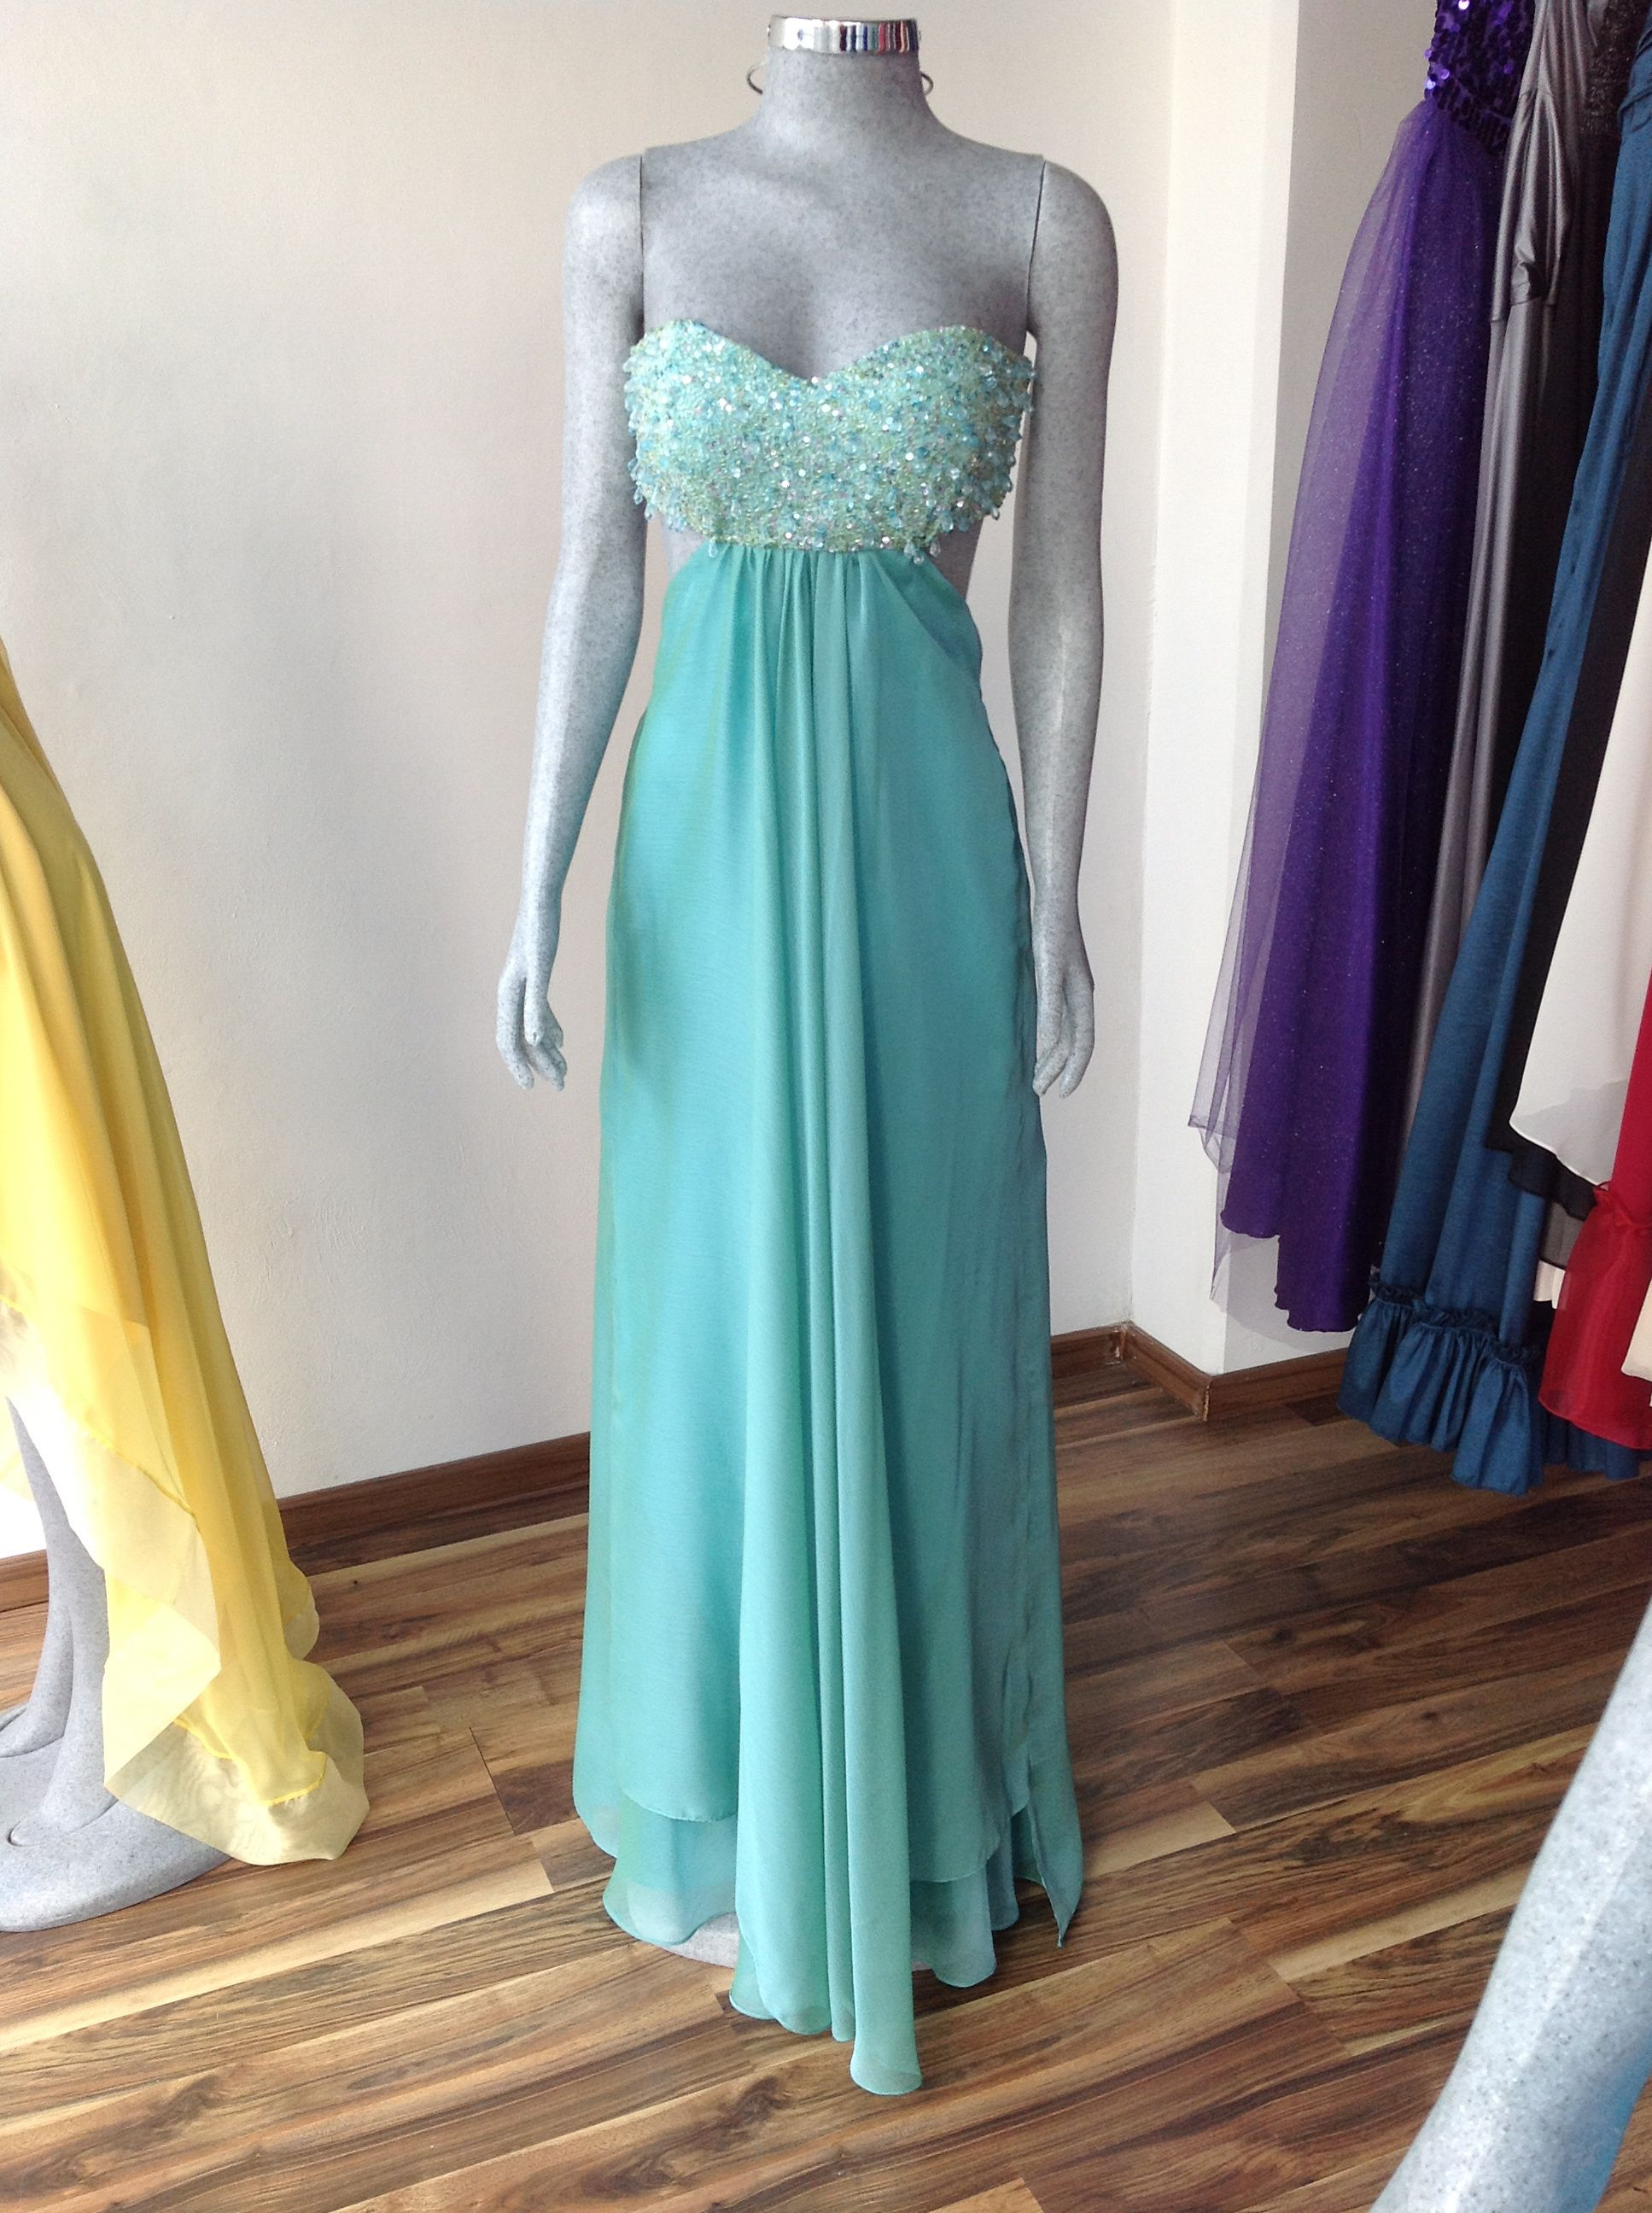 Turquoise Dress - Klädsel Couture Designs | Dresses | Pinterest ...